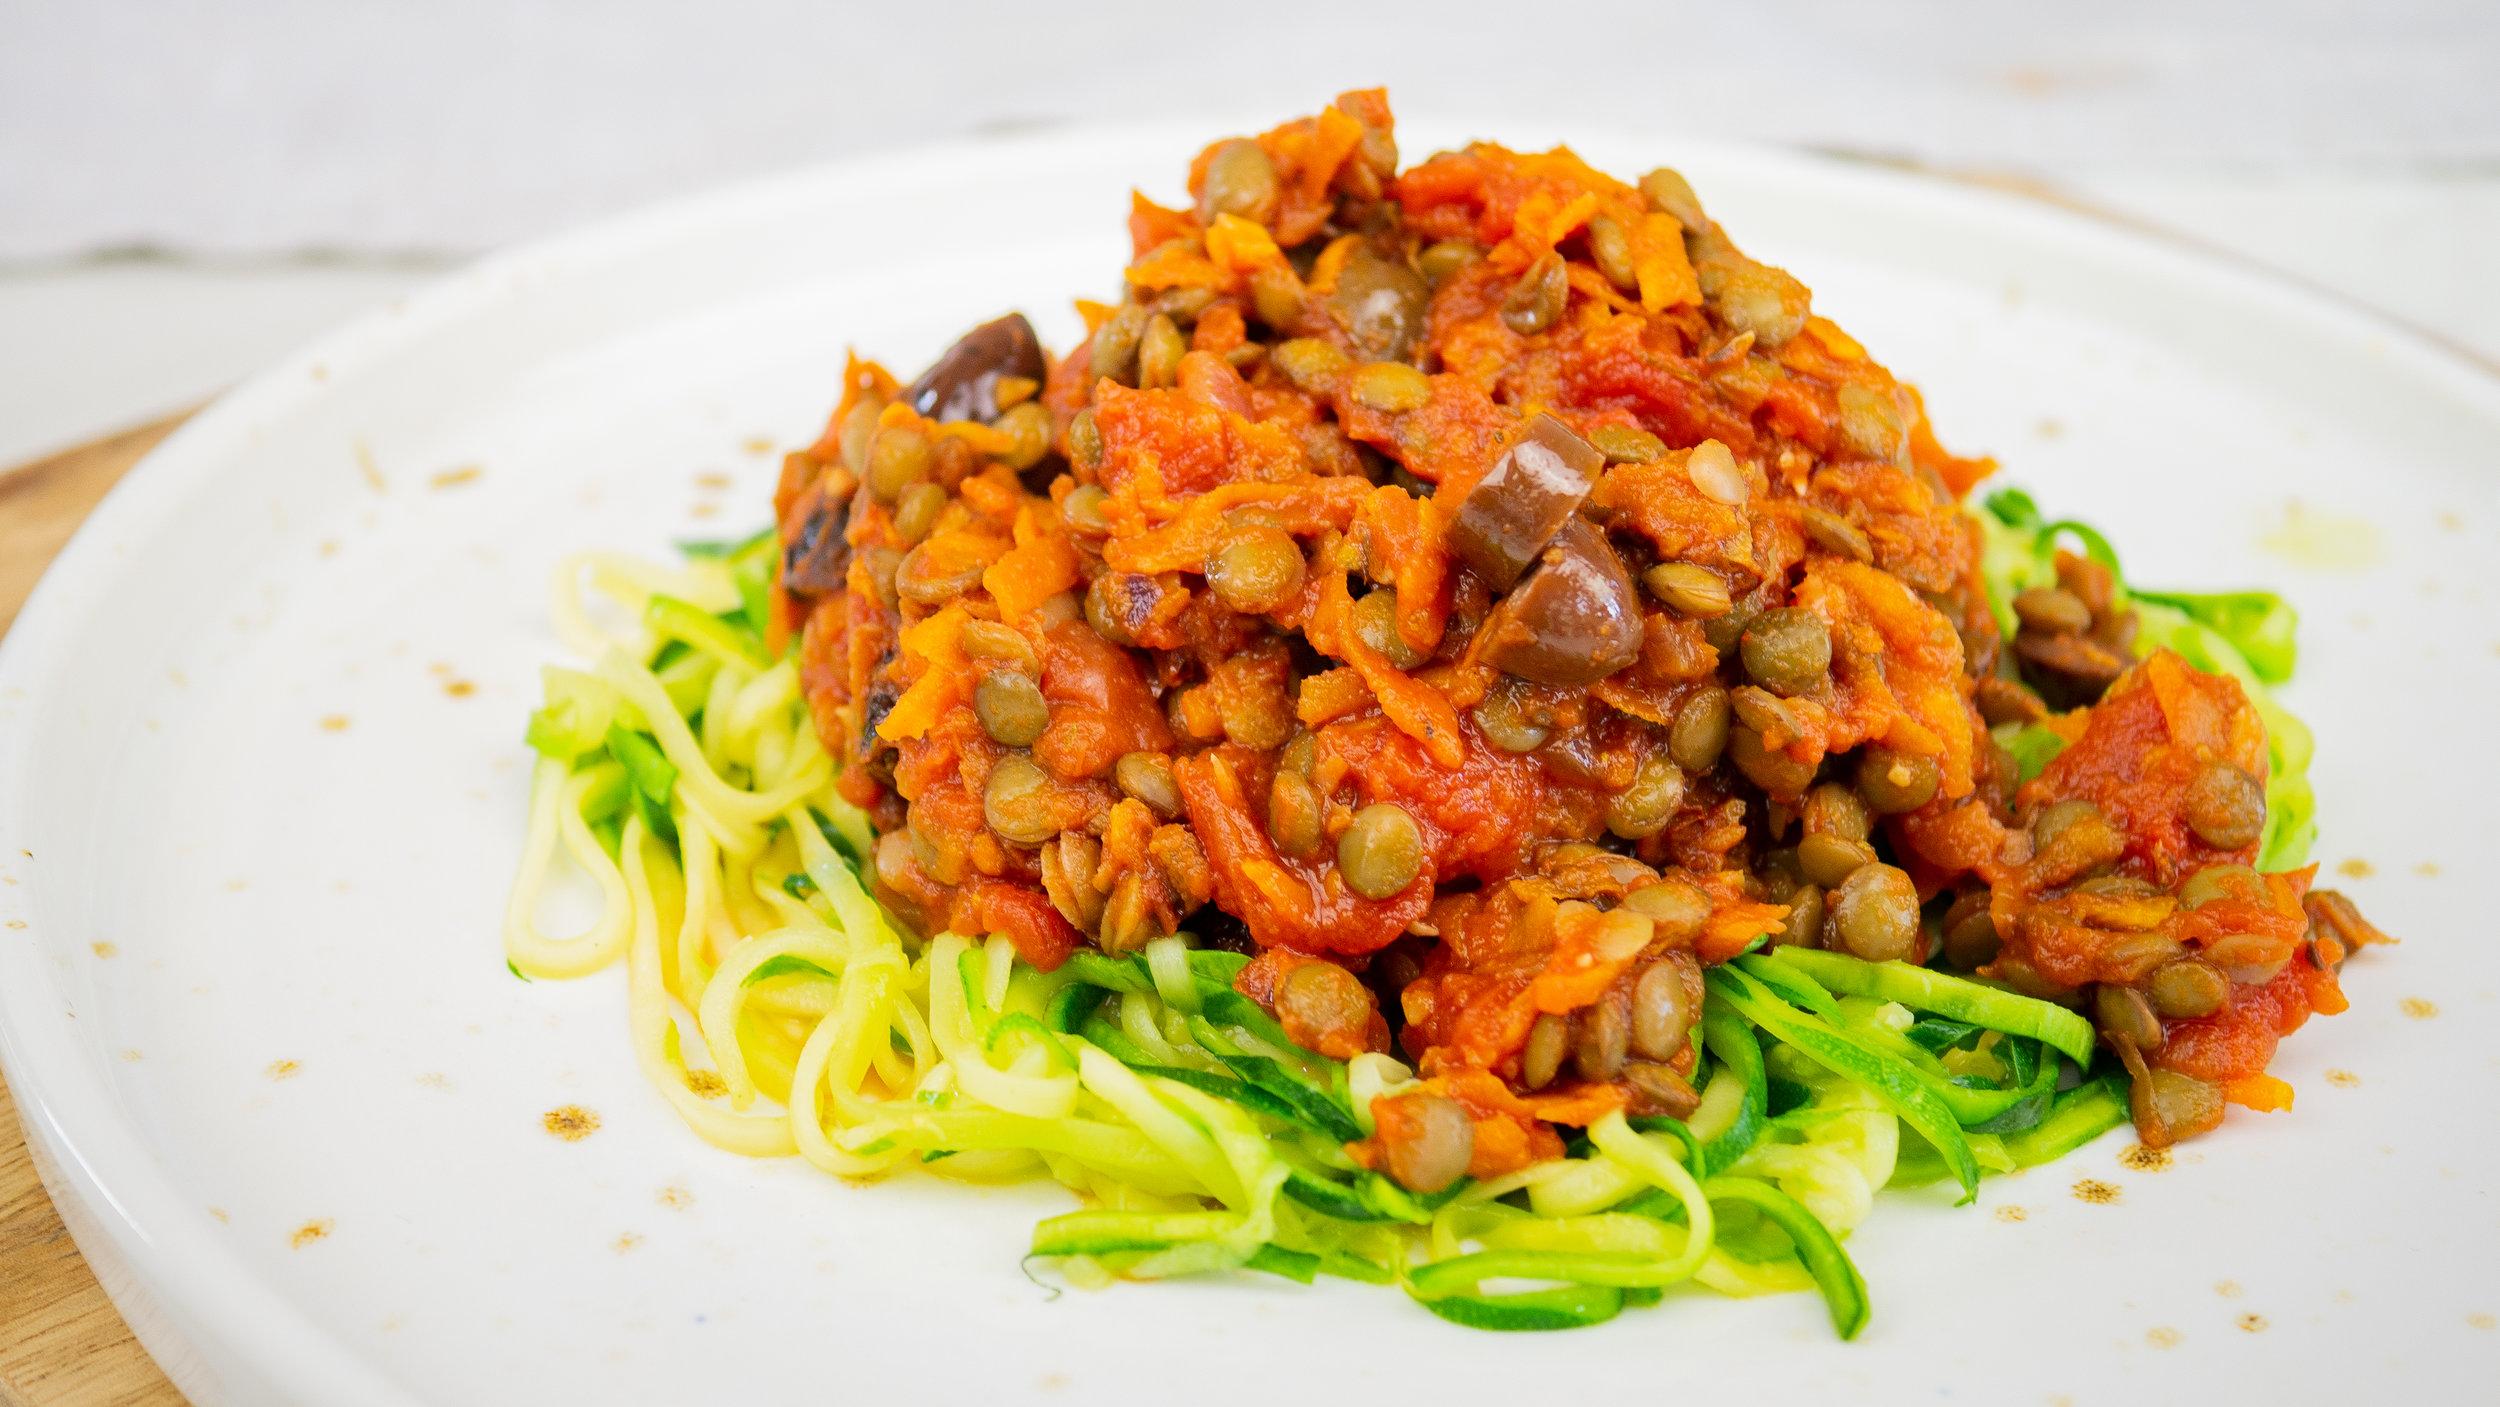 Lentil Bolognese with Zucchini Noodles